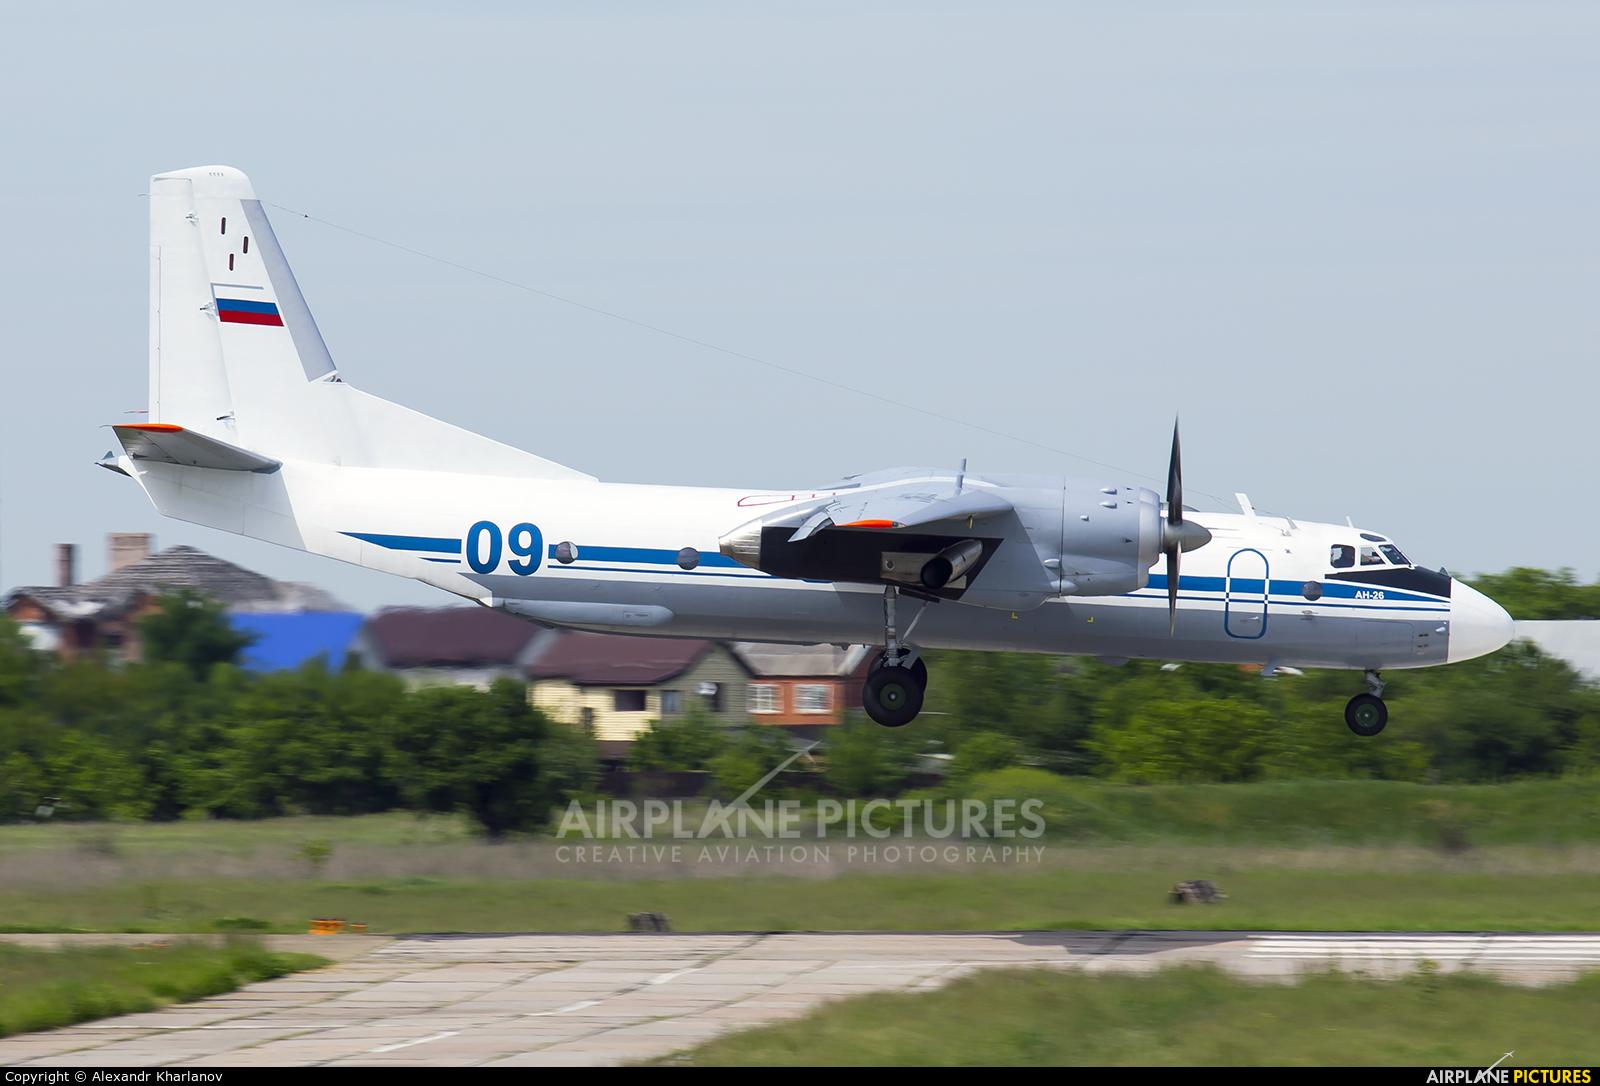 Russia - Air Force 09 aircraft at Krasnodar Tsentralny